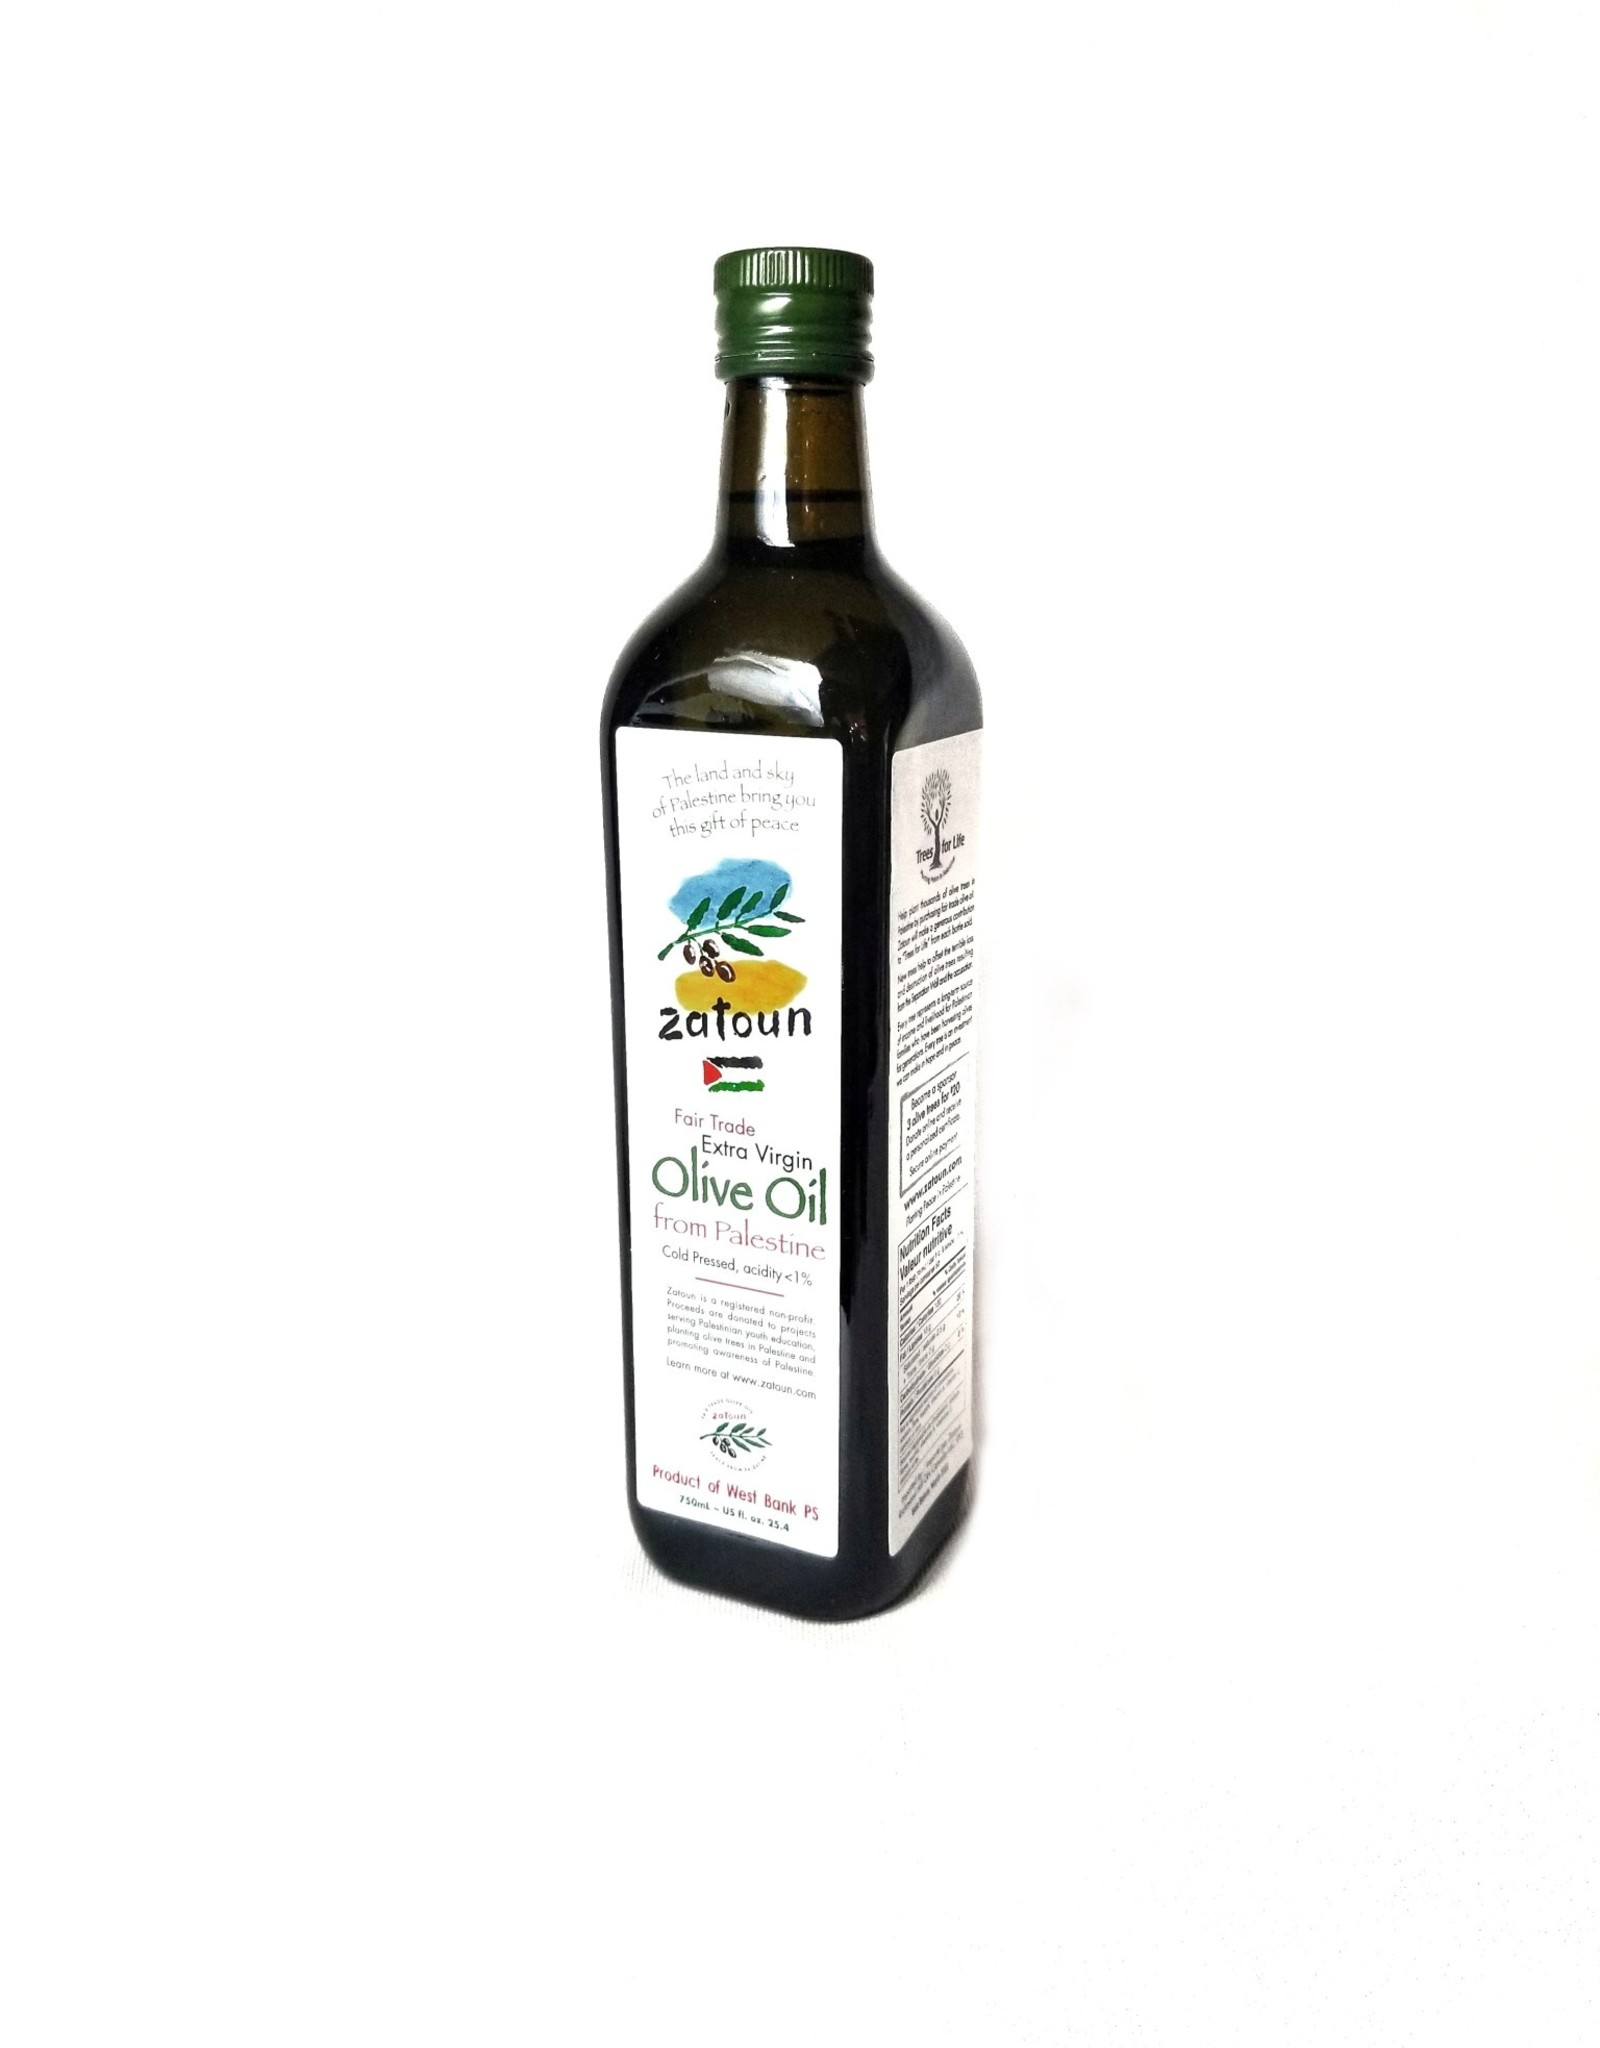 Zatoun Zatoun Fair Trade  Extra Virgin Olive Oil from Palestine